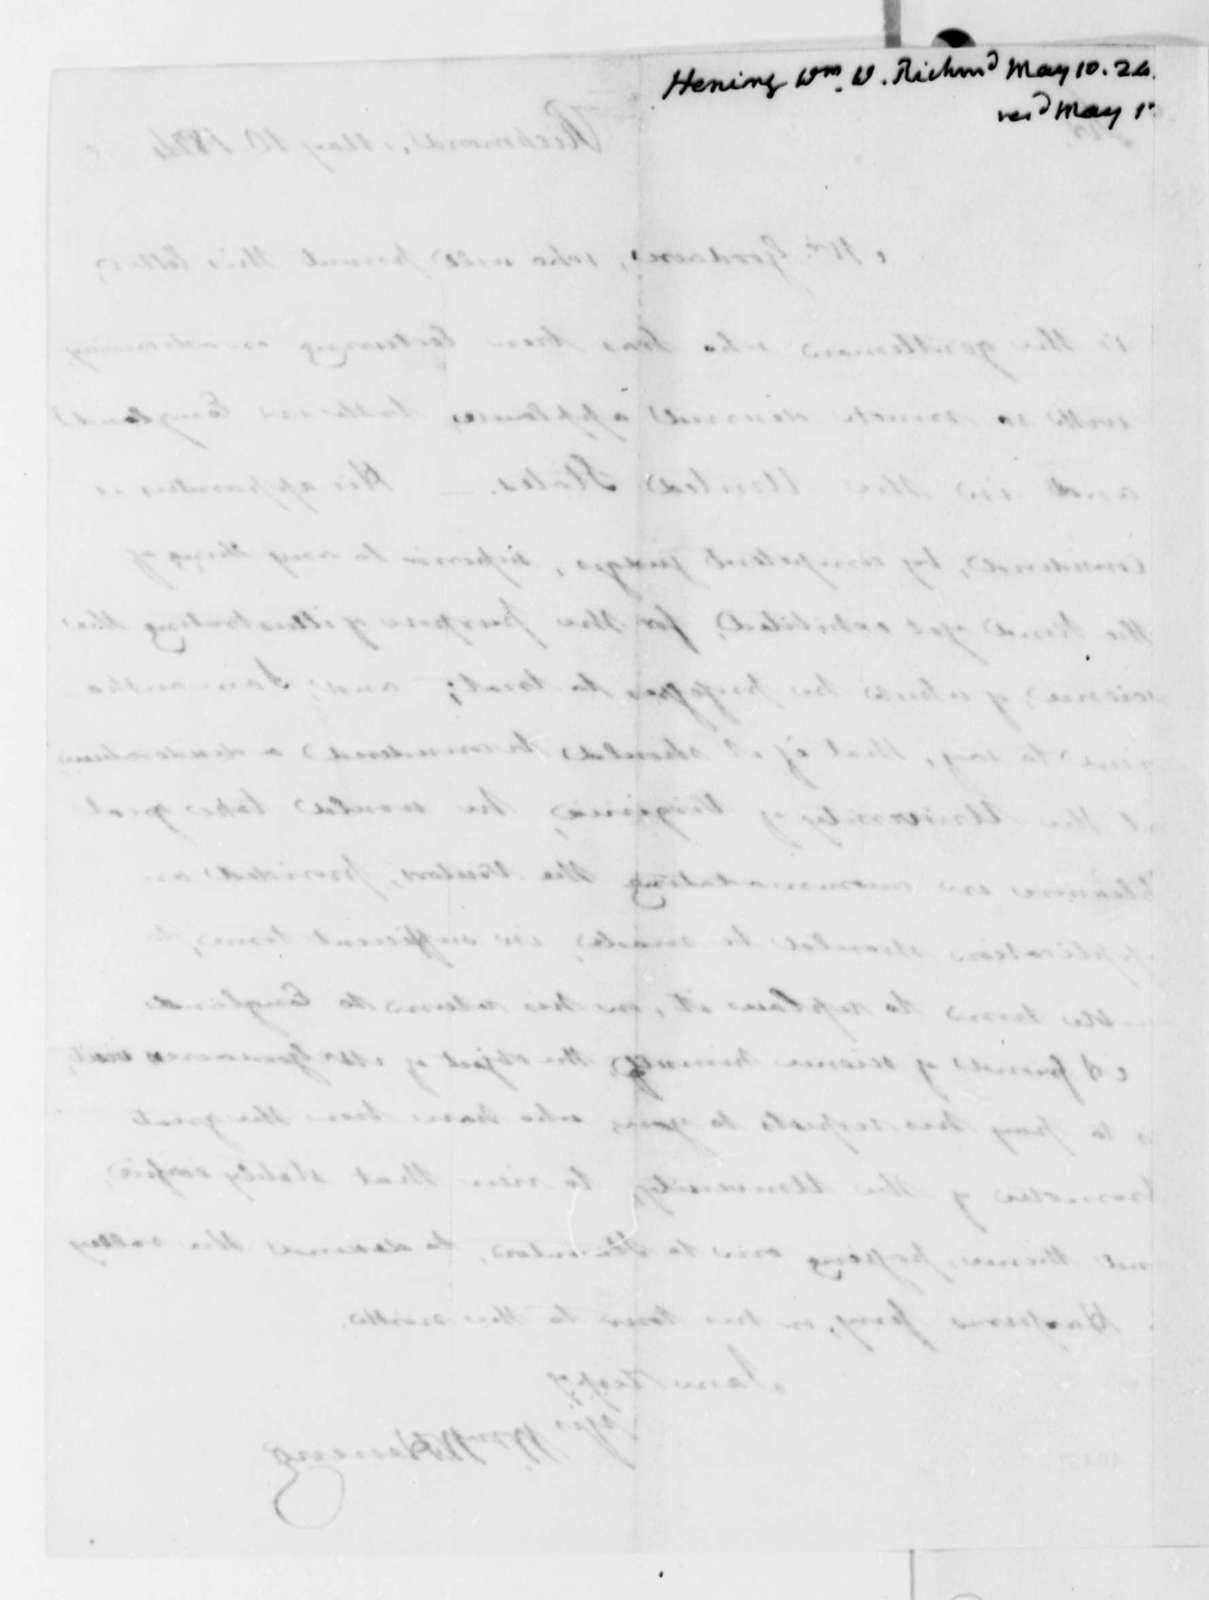 William Waller Hening to Thomas Jefferson, May 10, 1824